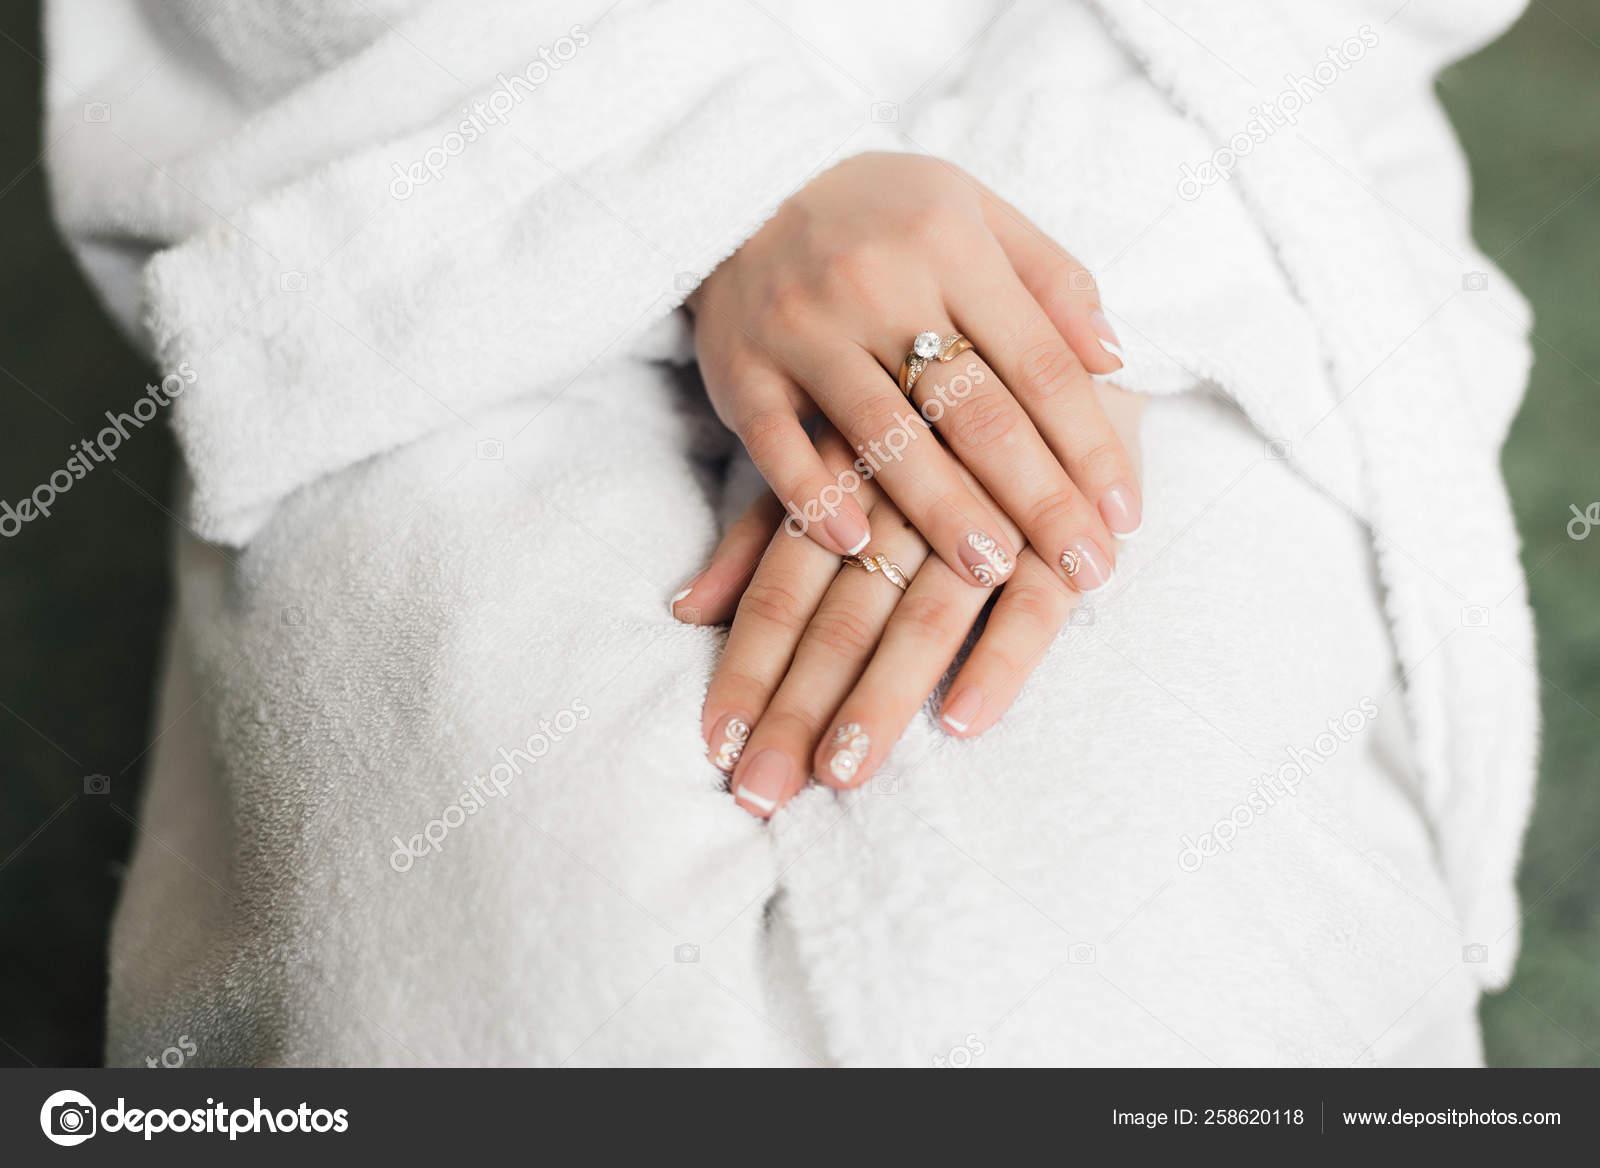 Bride Sits Bathrobe Her Arms Folded Her Lap Wedding Ring Stock Photo C Evgenyrukavitsyn 258620118